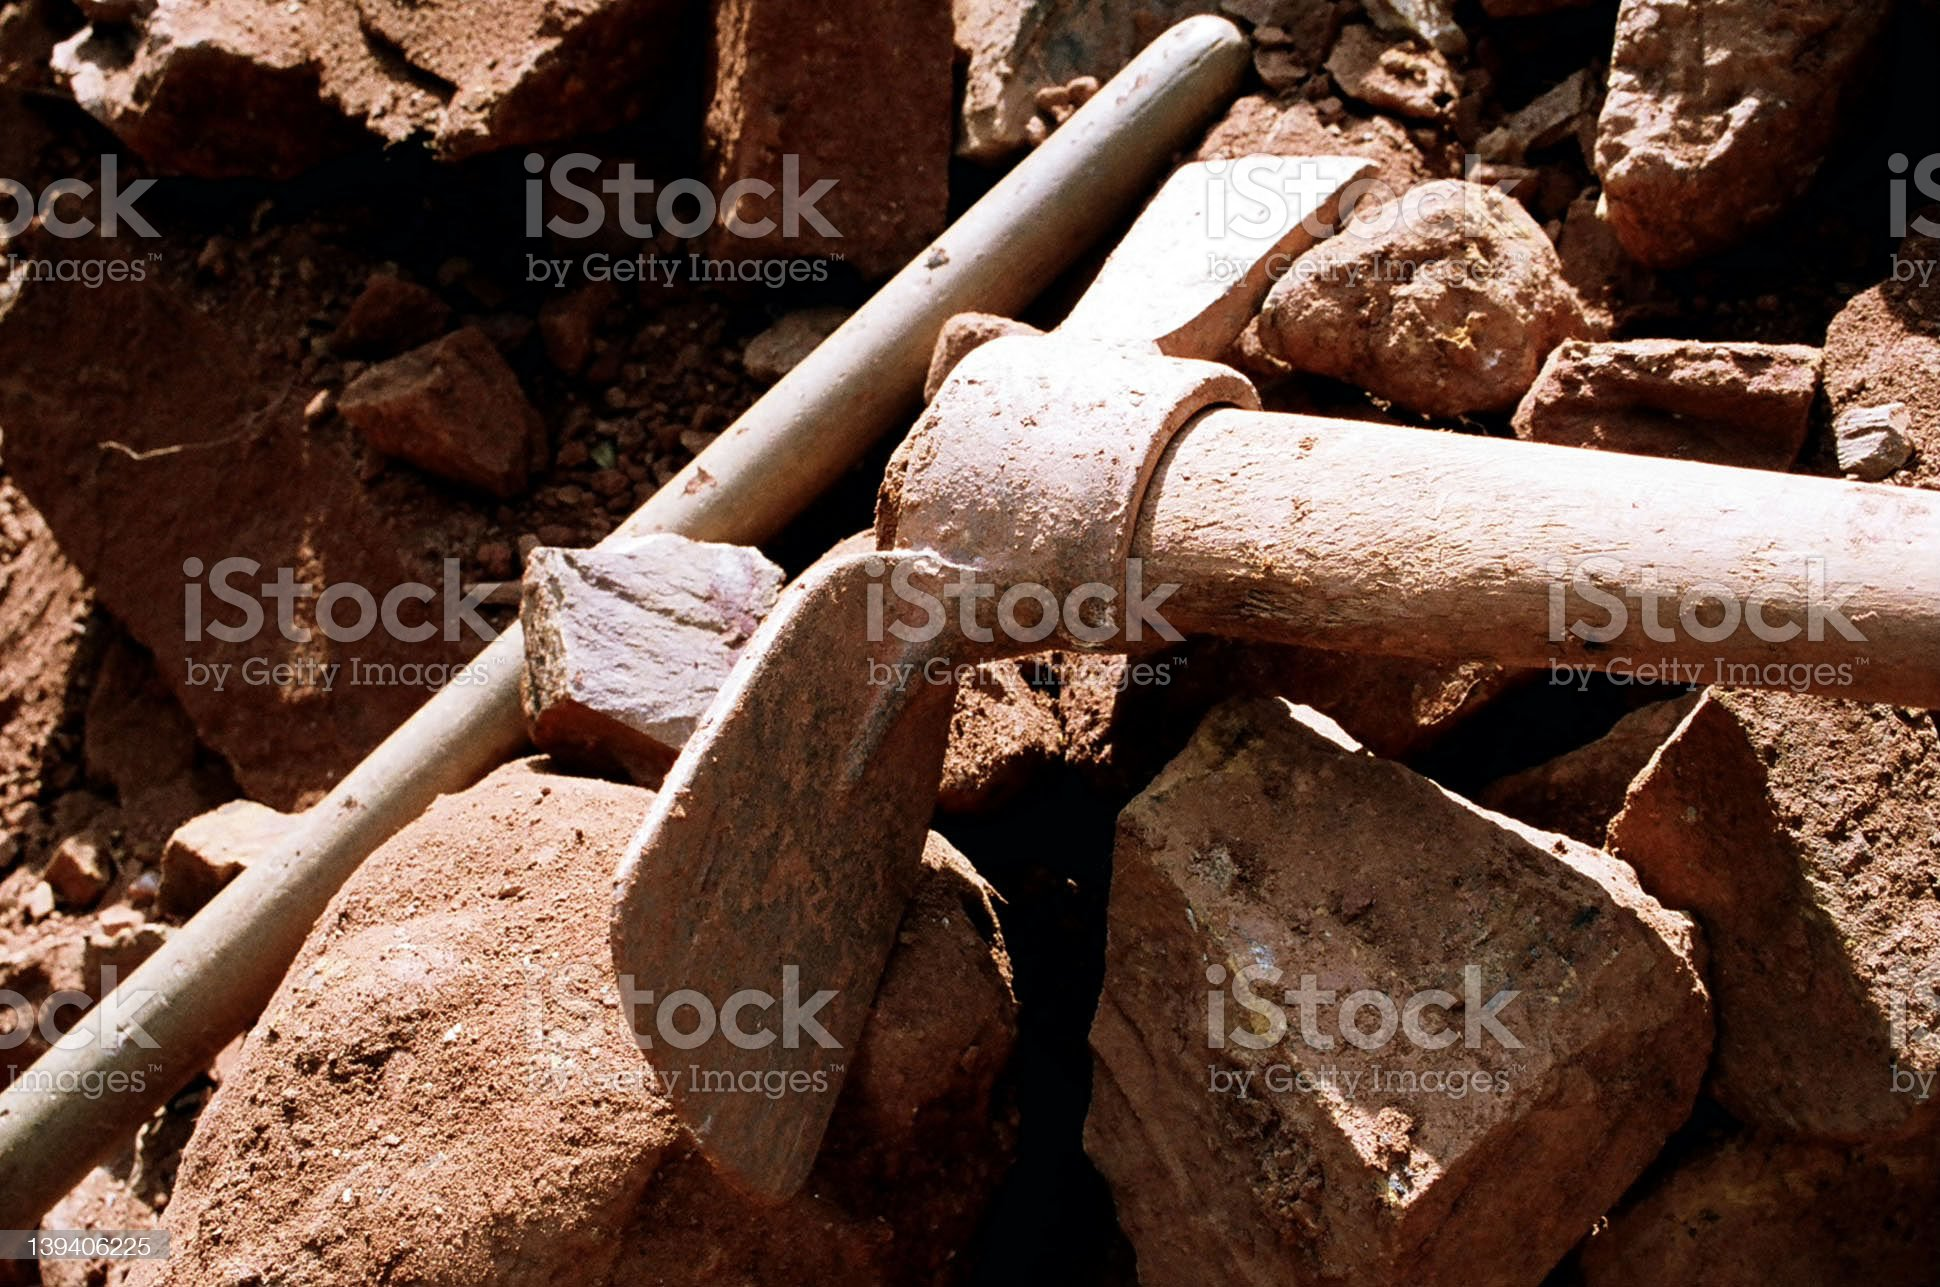 Pick Axe and Rocks royalty-free stock photo